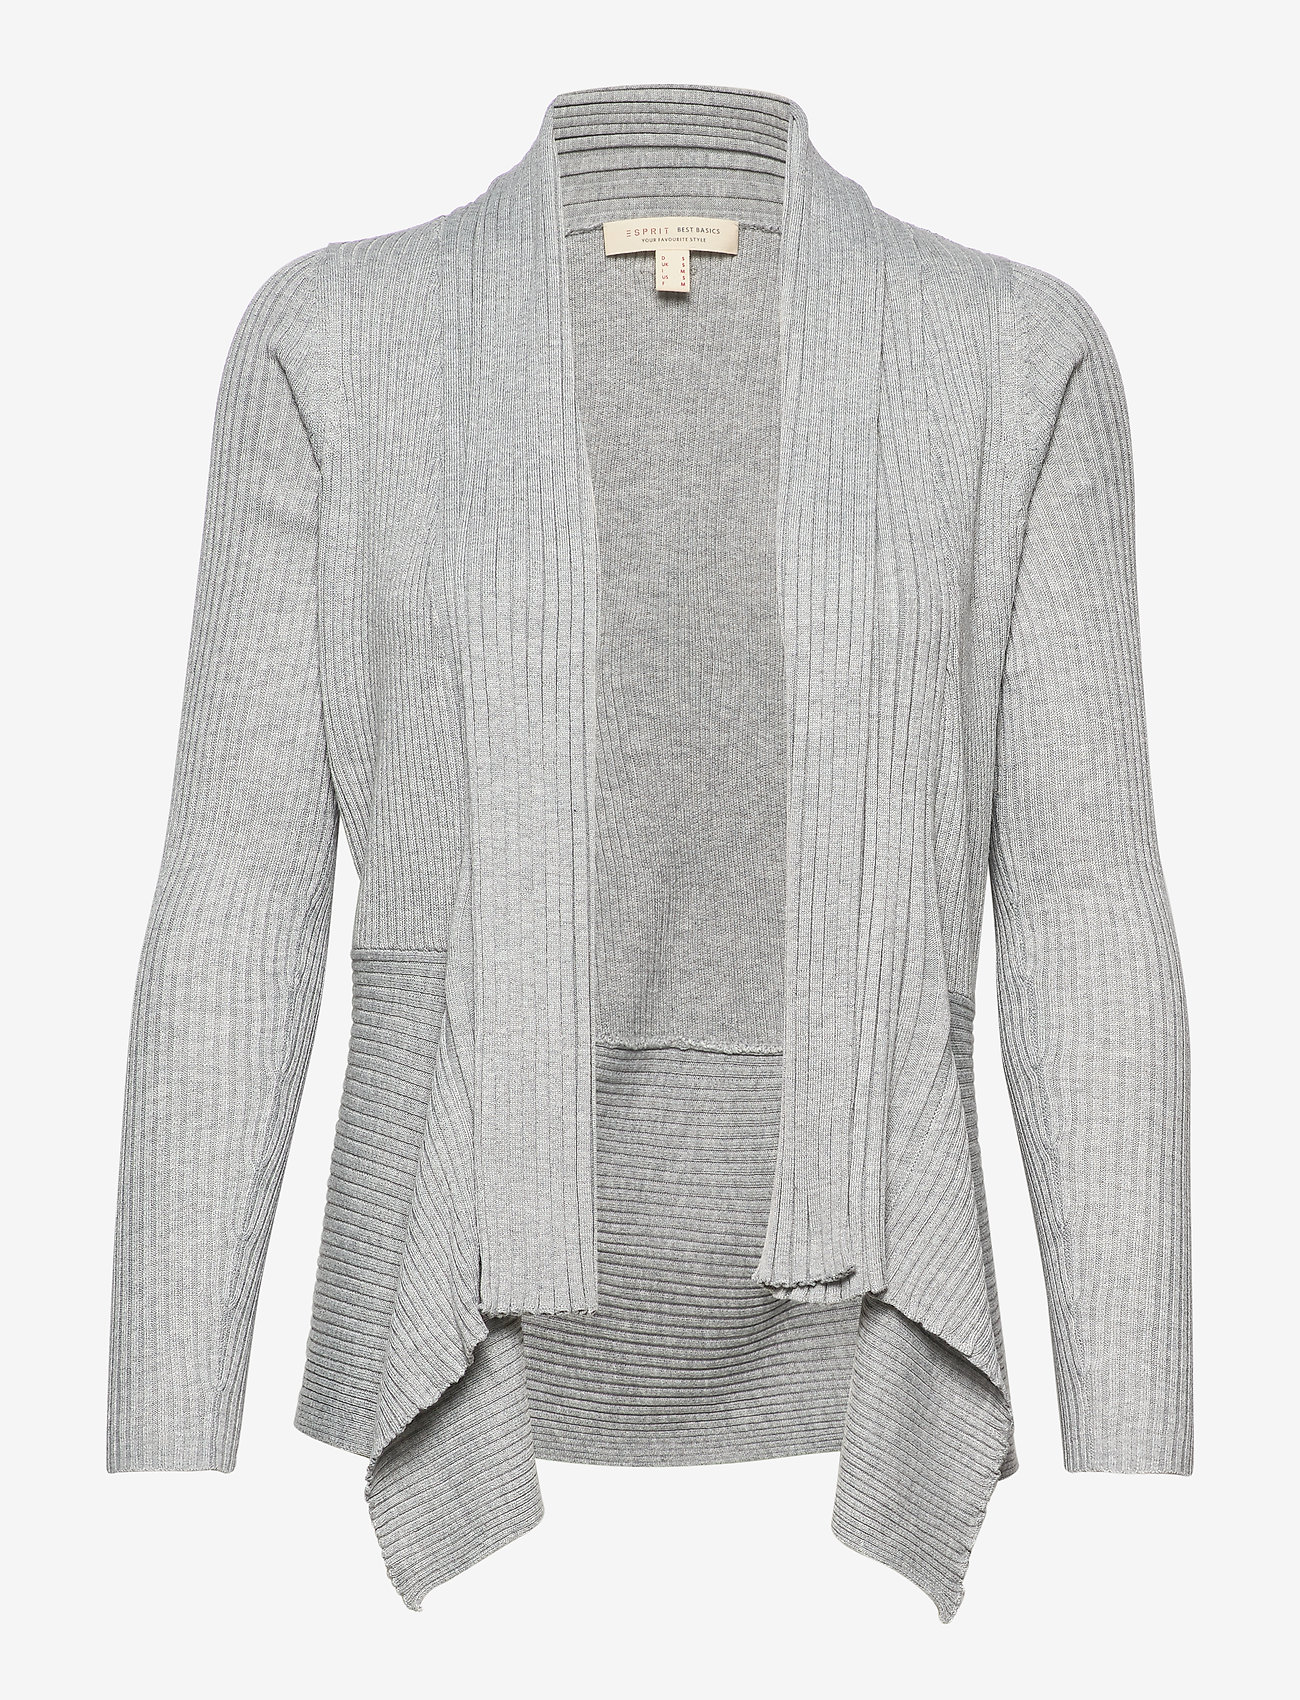 Esprit Casual - Sweaters cardigan - cardigans - light grey 5 - 0